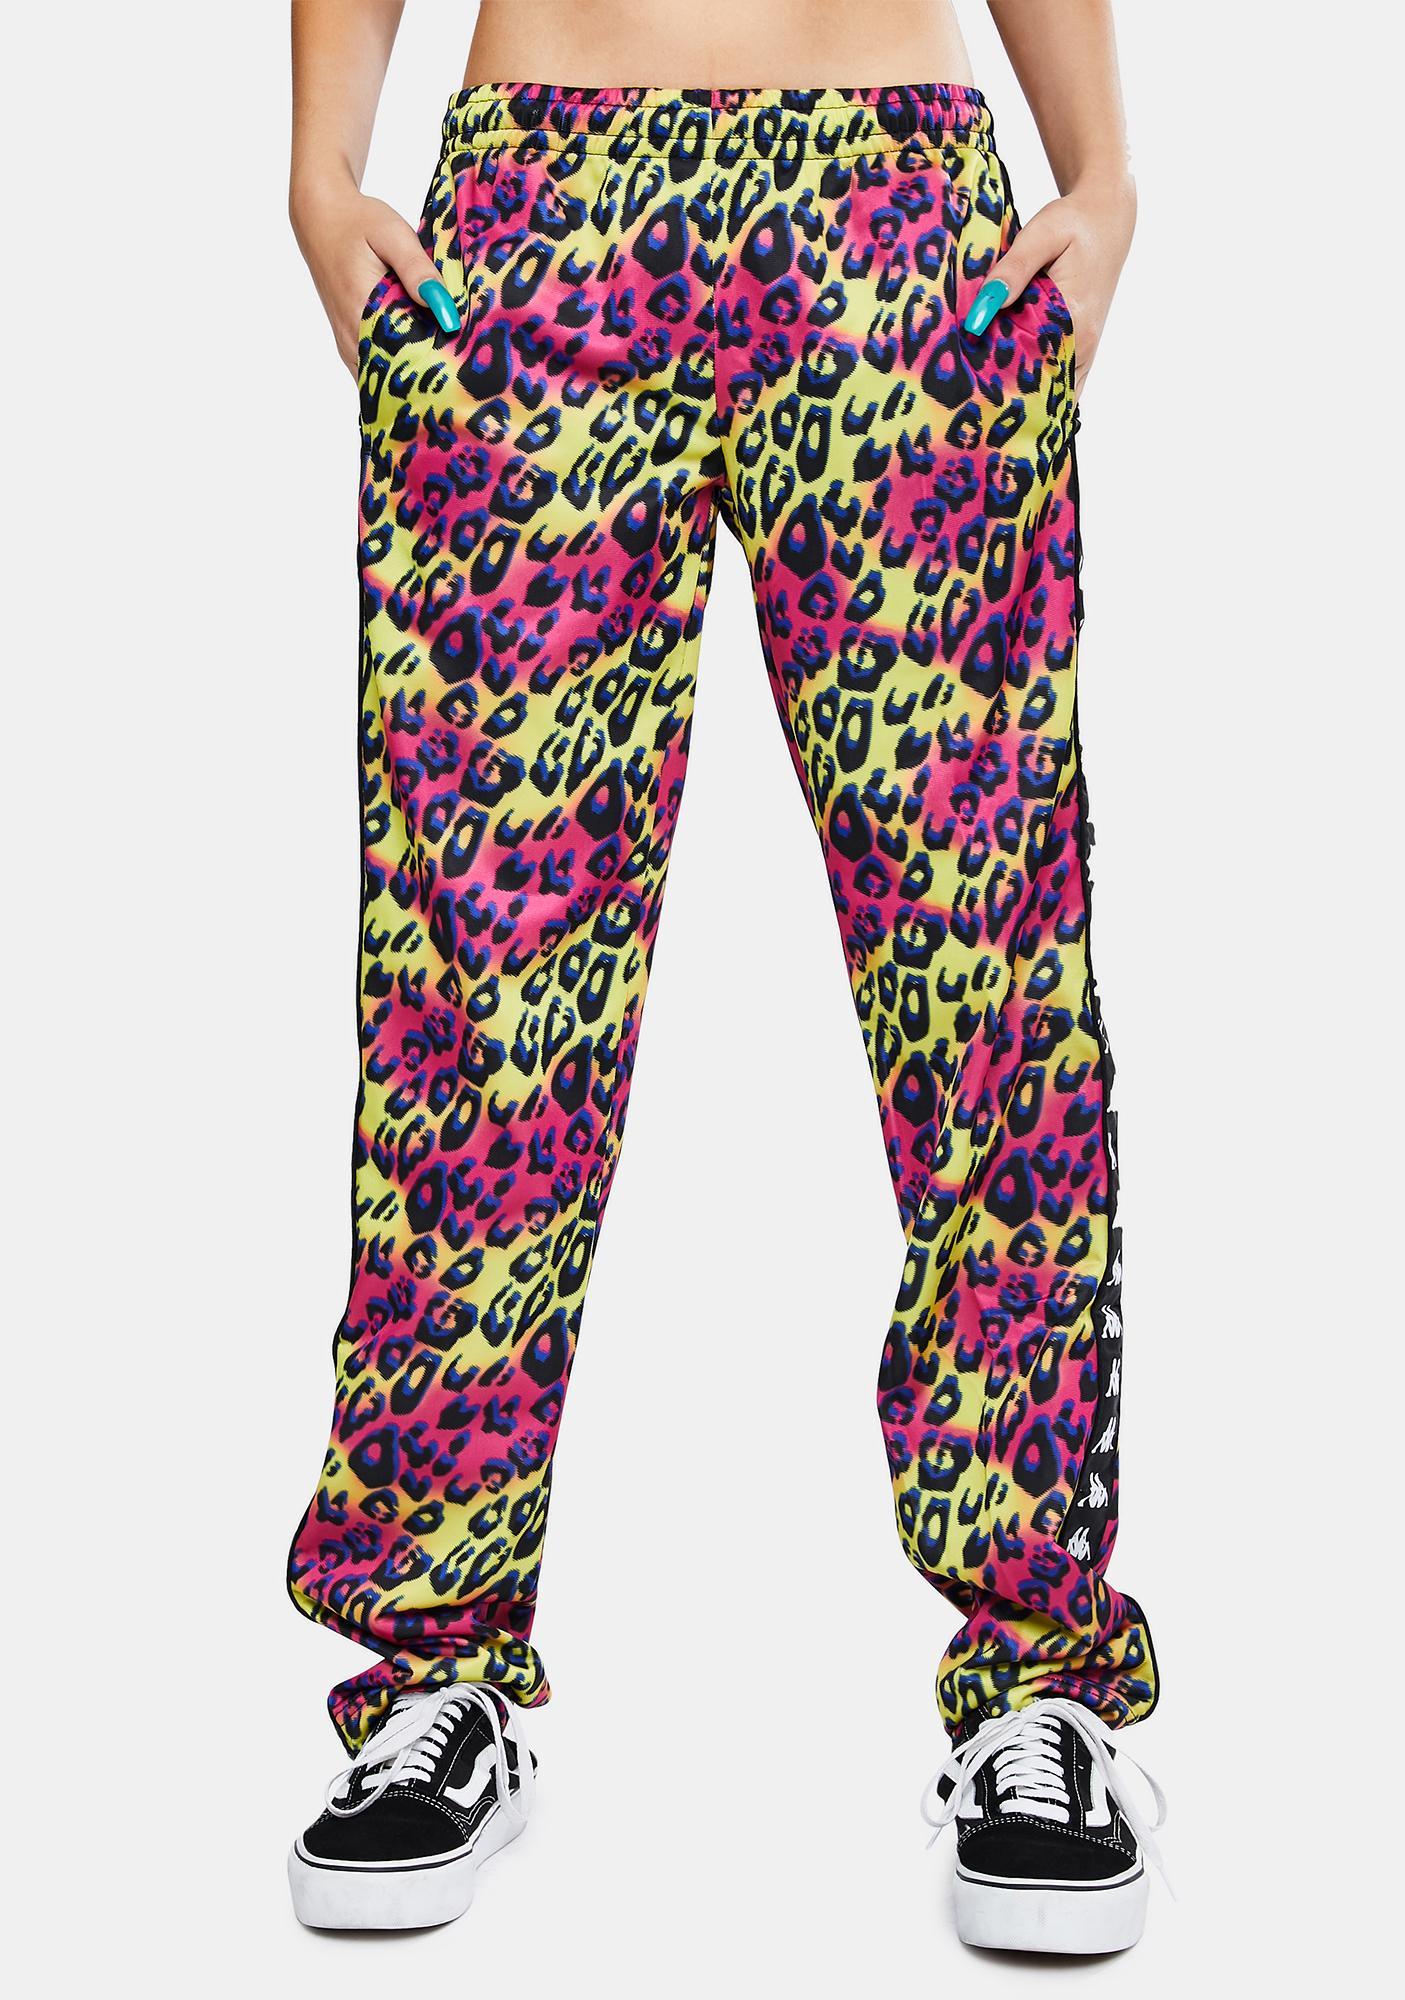 Kappa Leopard 222 Banda Wastoria Pants